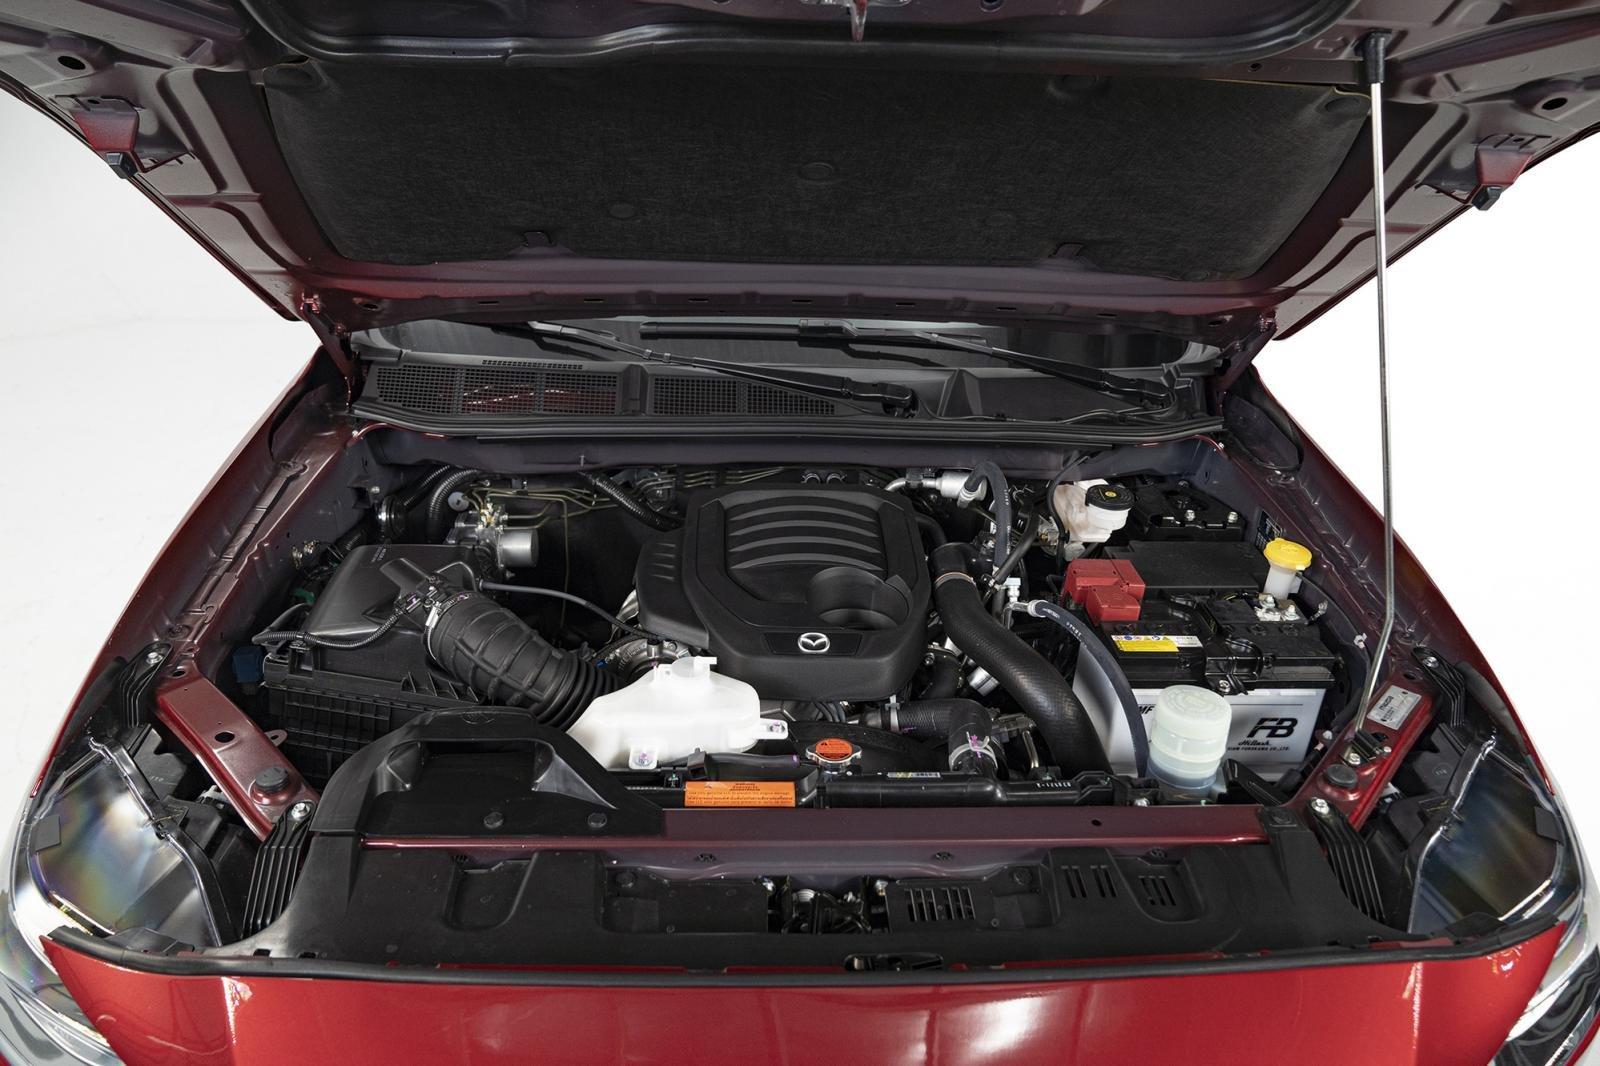 Mazda-BT50-2021-canh-tranh-ranger-hilux-triton-anh-15.jpg